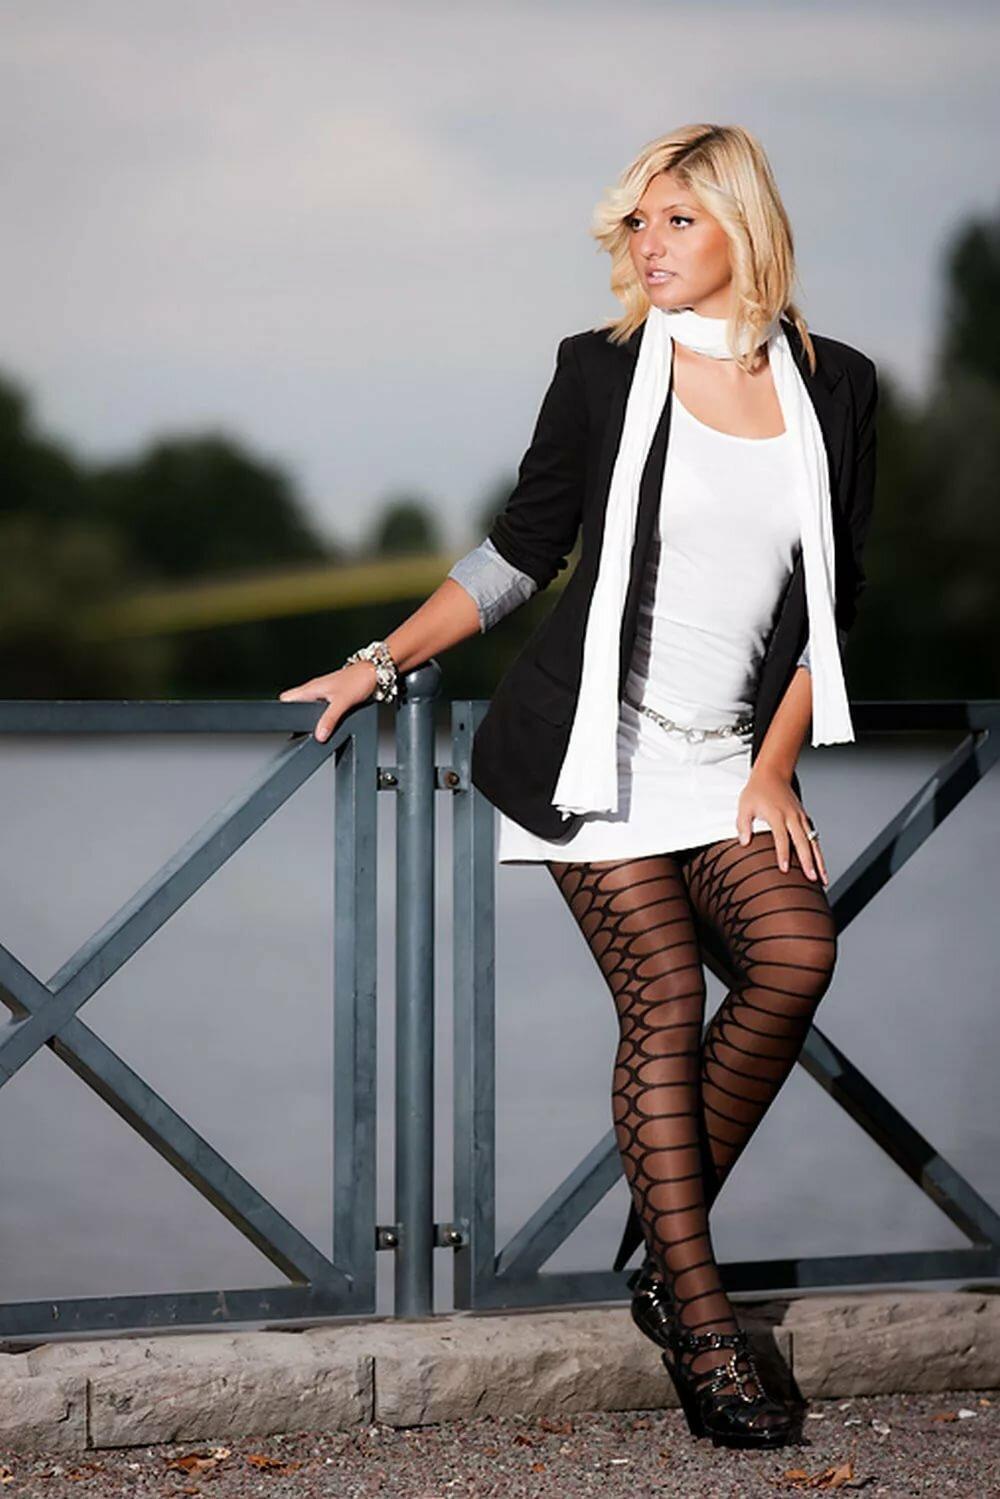 pattern black tights with black dress - HD1000×1499